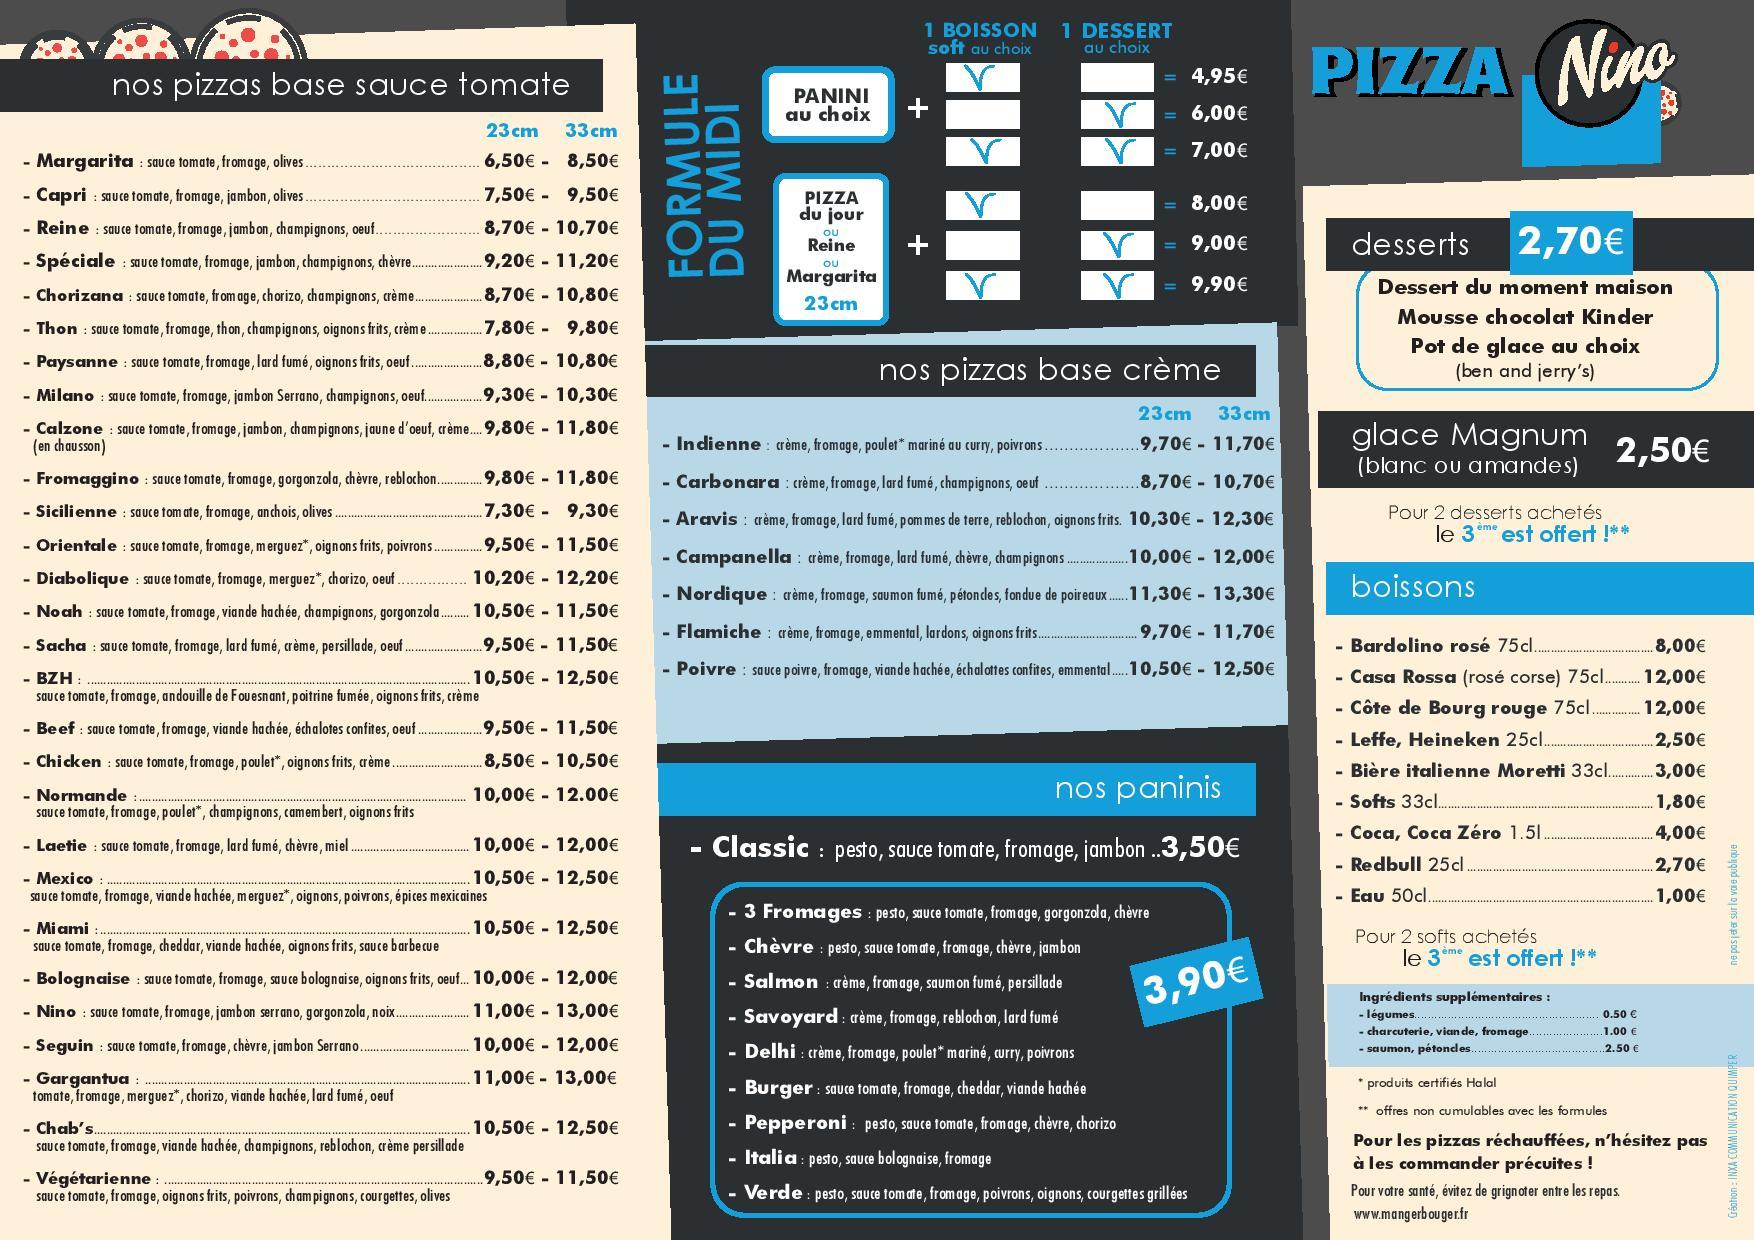 pizza nino a quimper pizzeria